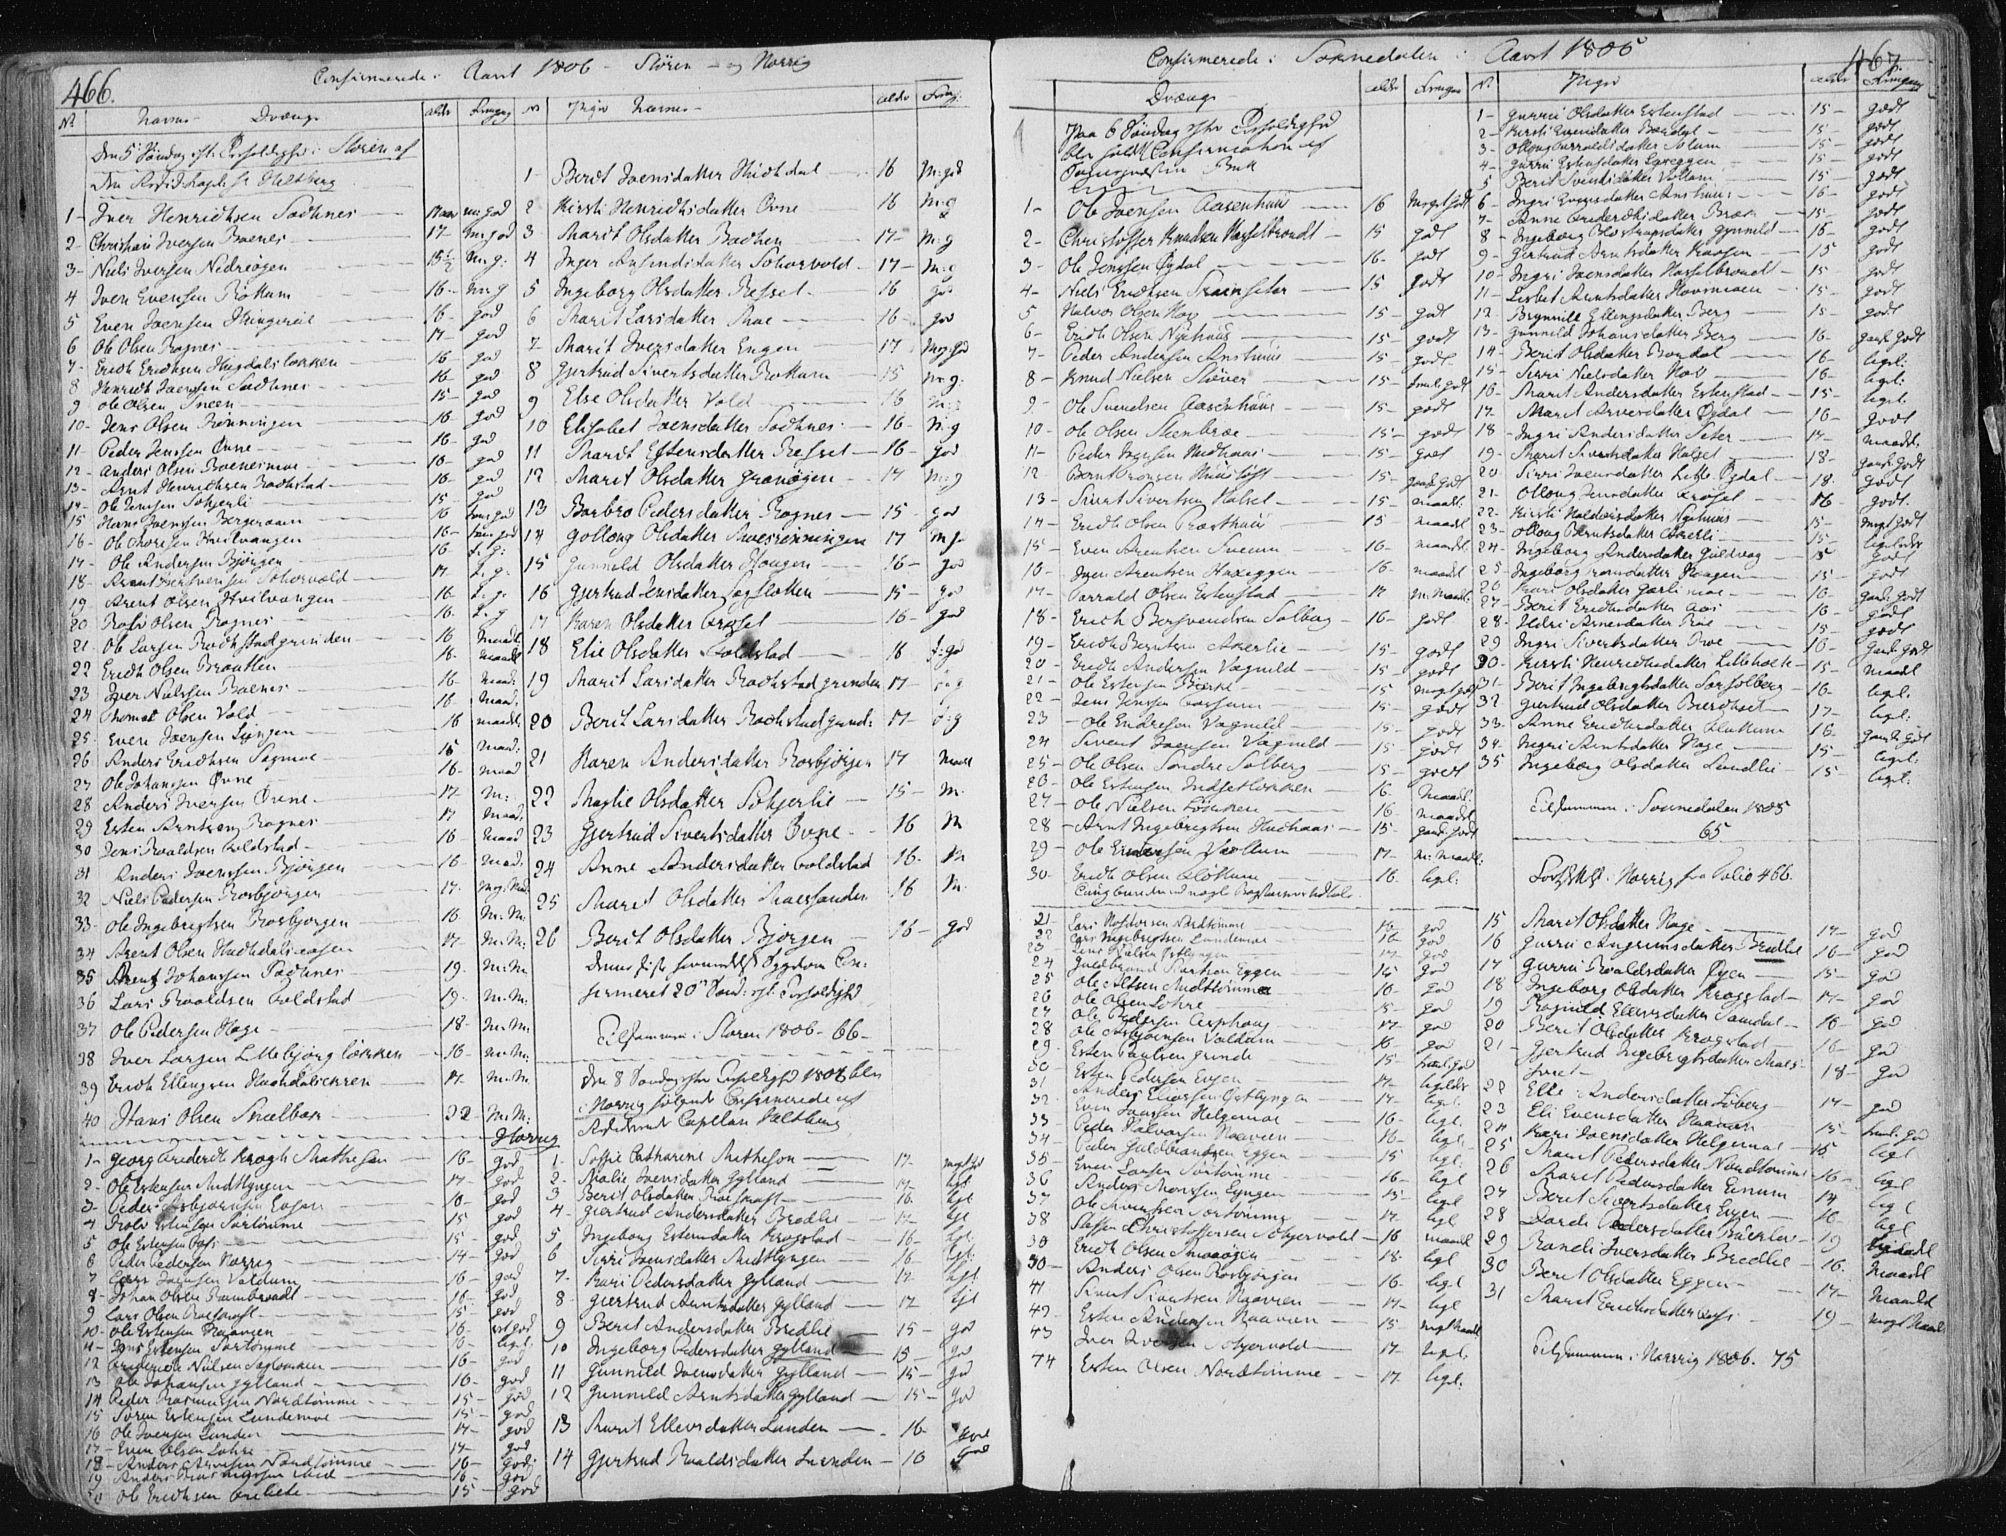 SAT, Ministerialprotokoller, klokkerbøker og fødselsregistre - Sør-Trøndelag, 687/L0992: Parish register (official) no. 687A03 /1, 1788-1815, p. 466-467